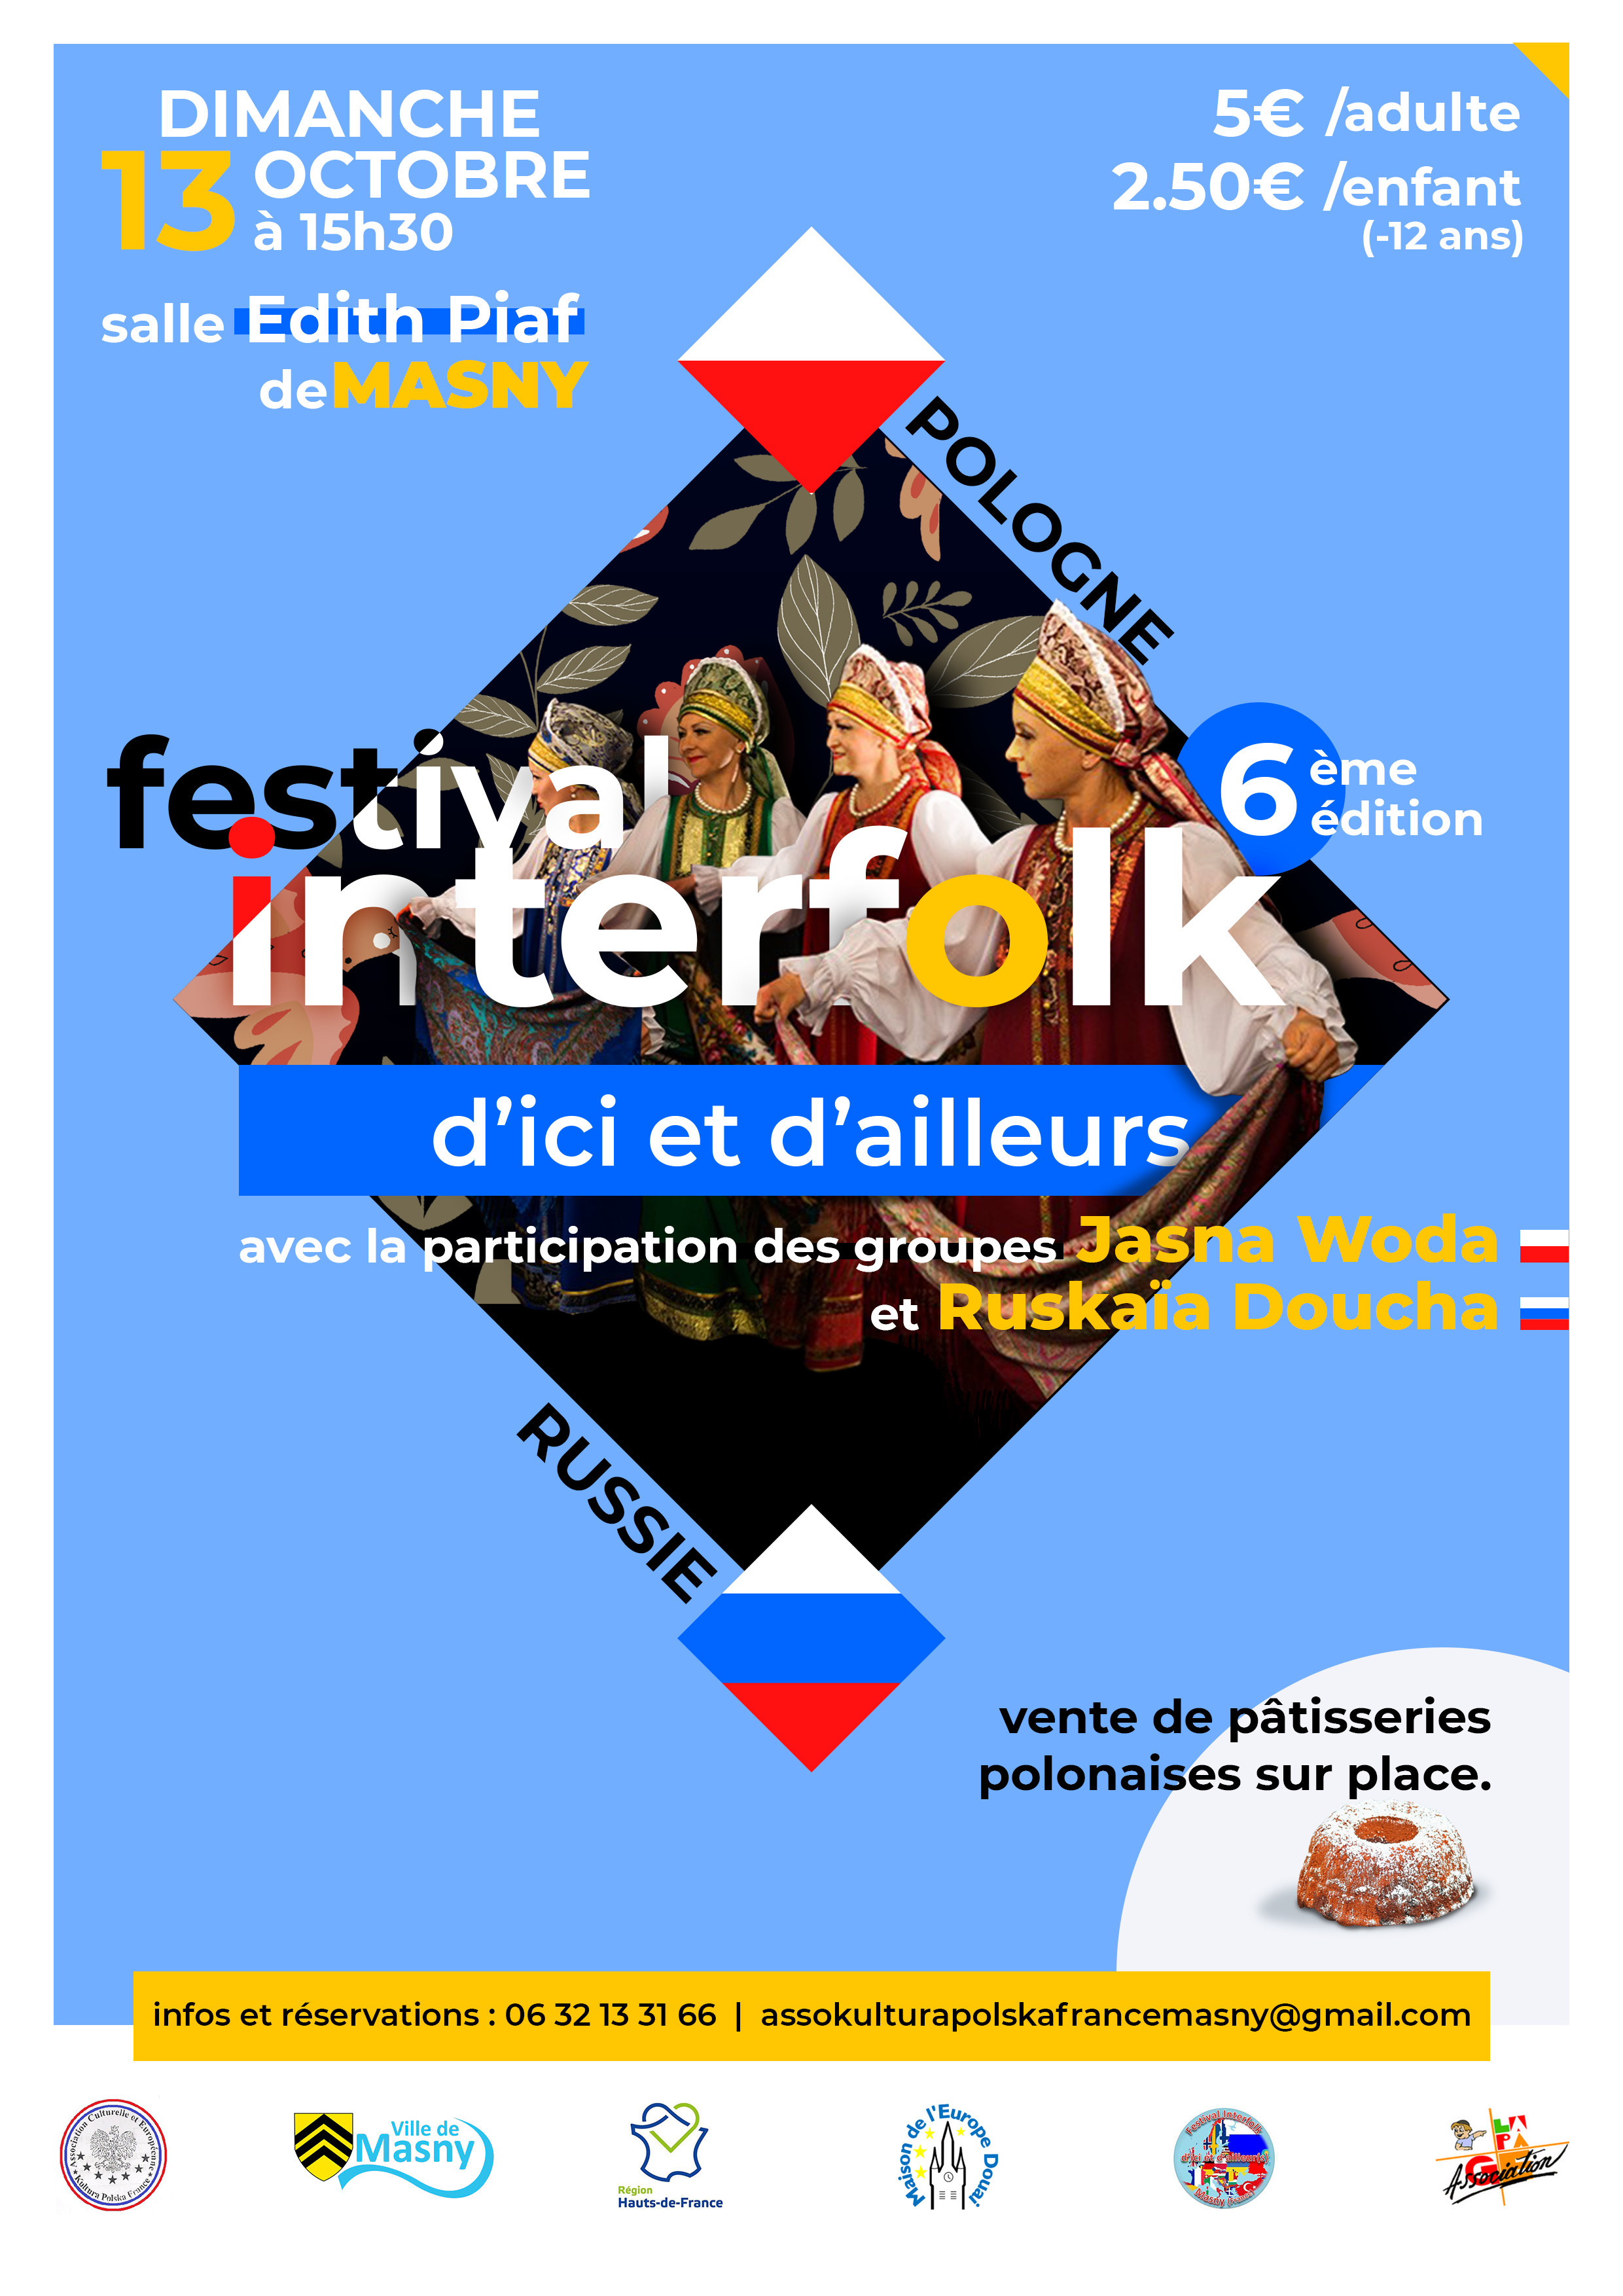 FESTIVAL INTERFOLK D'ICI ET D'AILLEURS @ SALLE EDITH PIAF